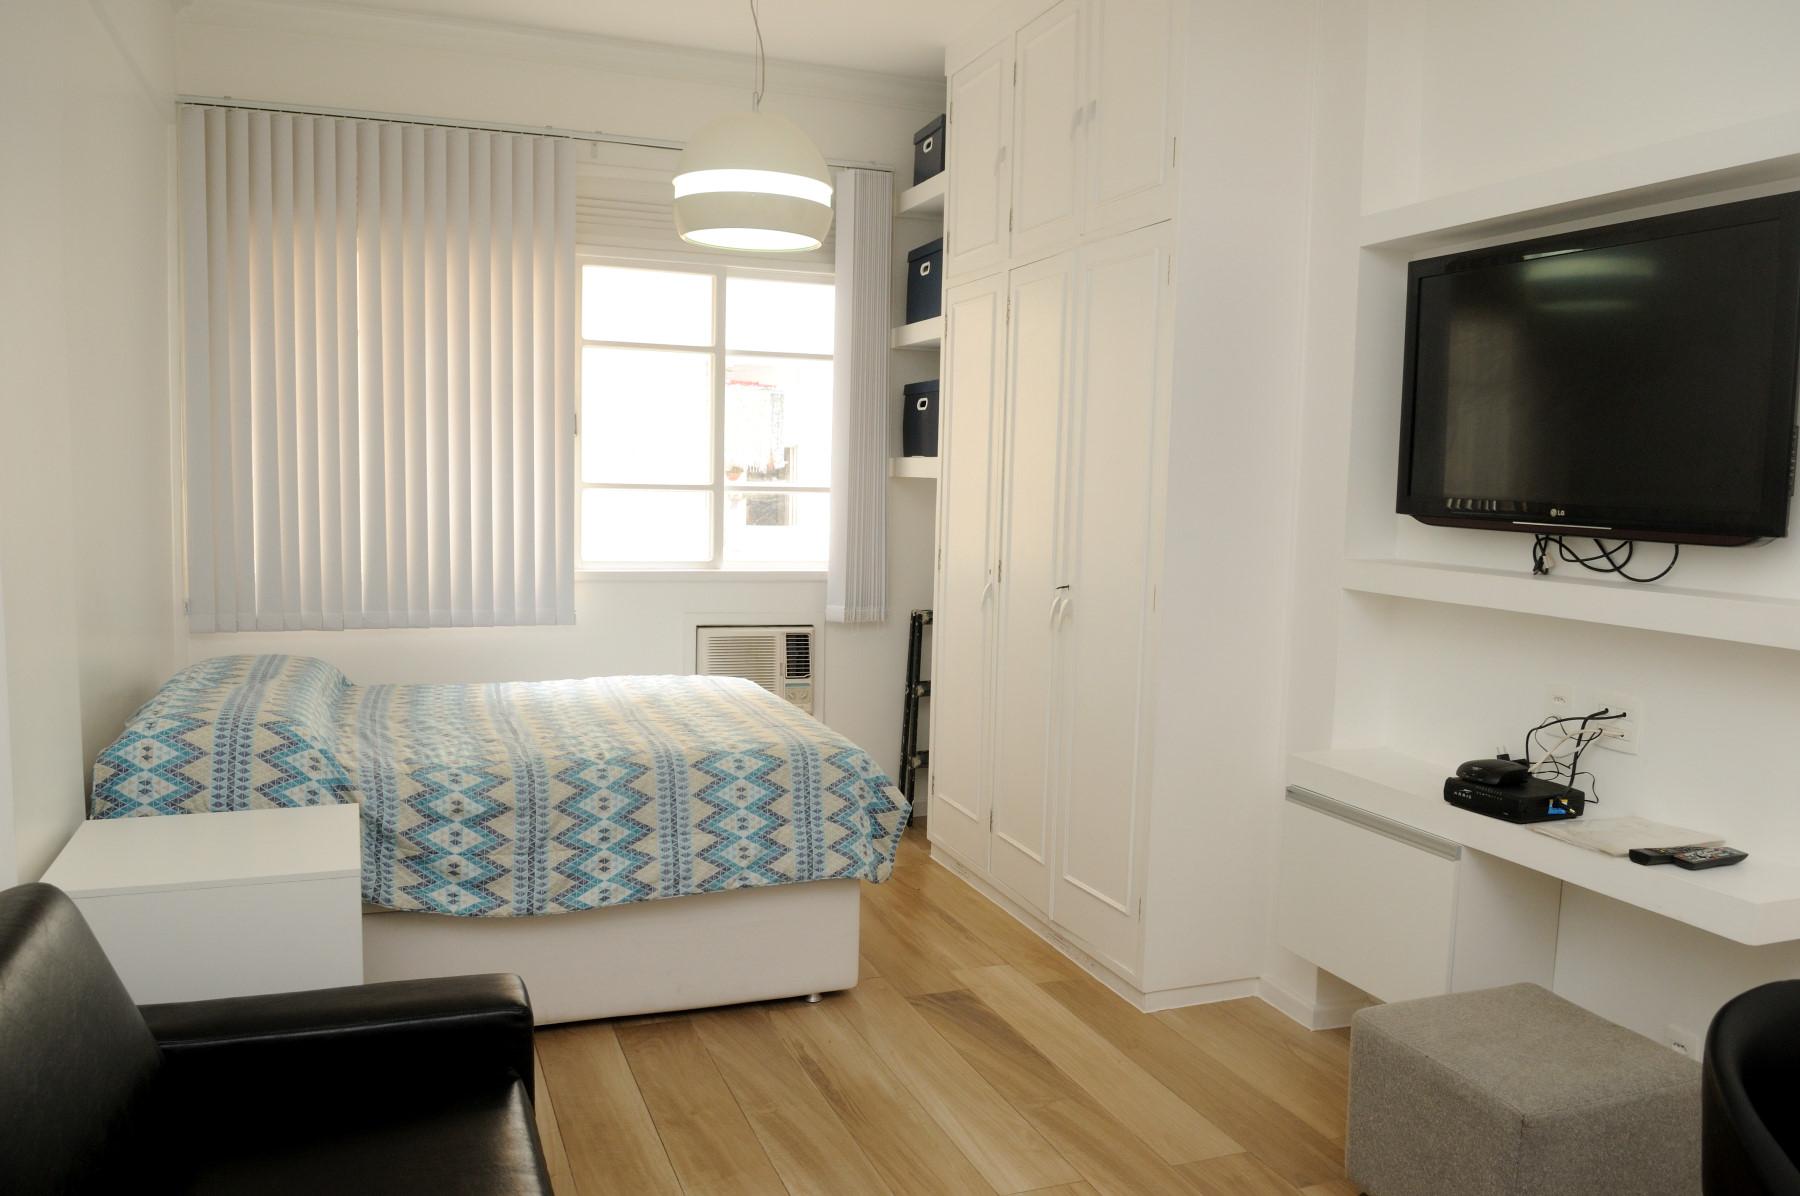 wohnung f r langzeitmiete in rio de janeiro copacabana objekt nr 867 max 2 personen. Black Bedroom Furniture Sets. Home Design Ideas